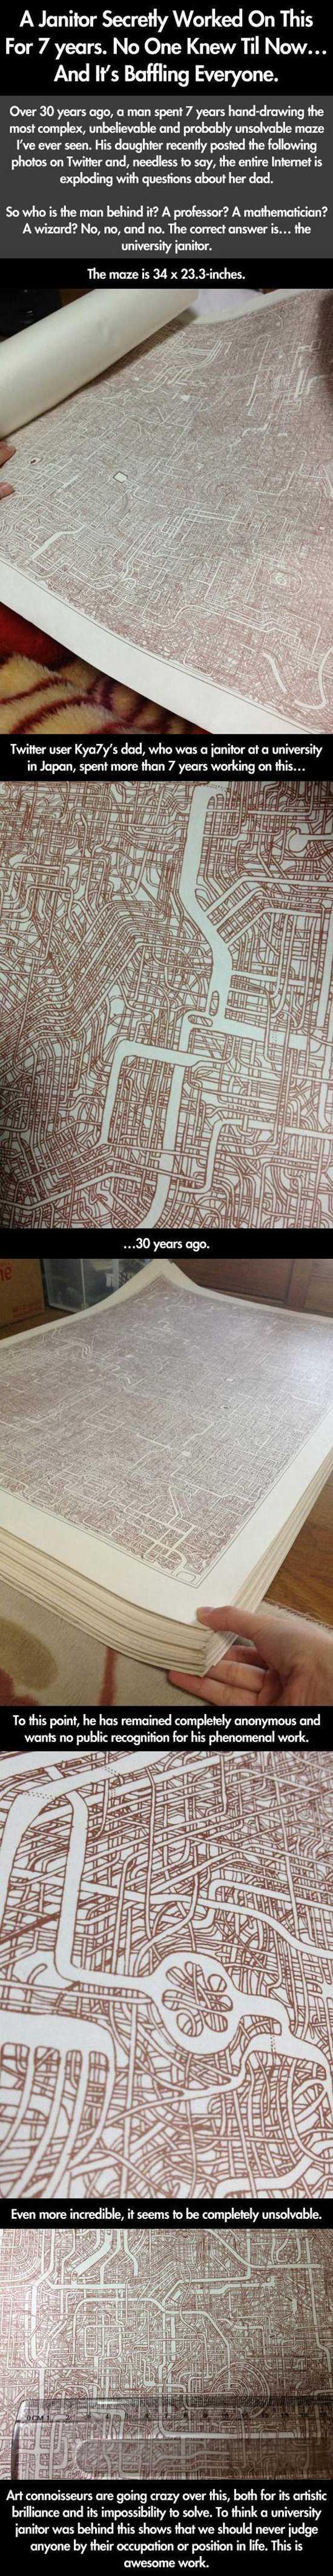 30_years_ago_261114b3